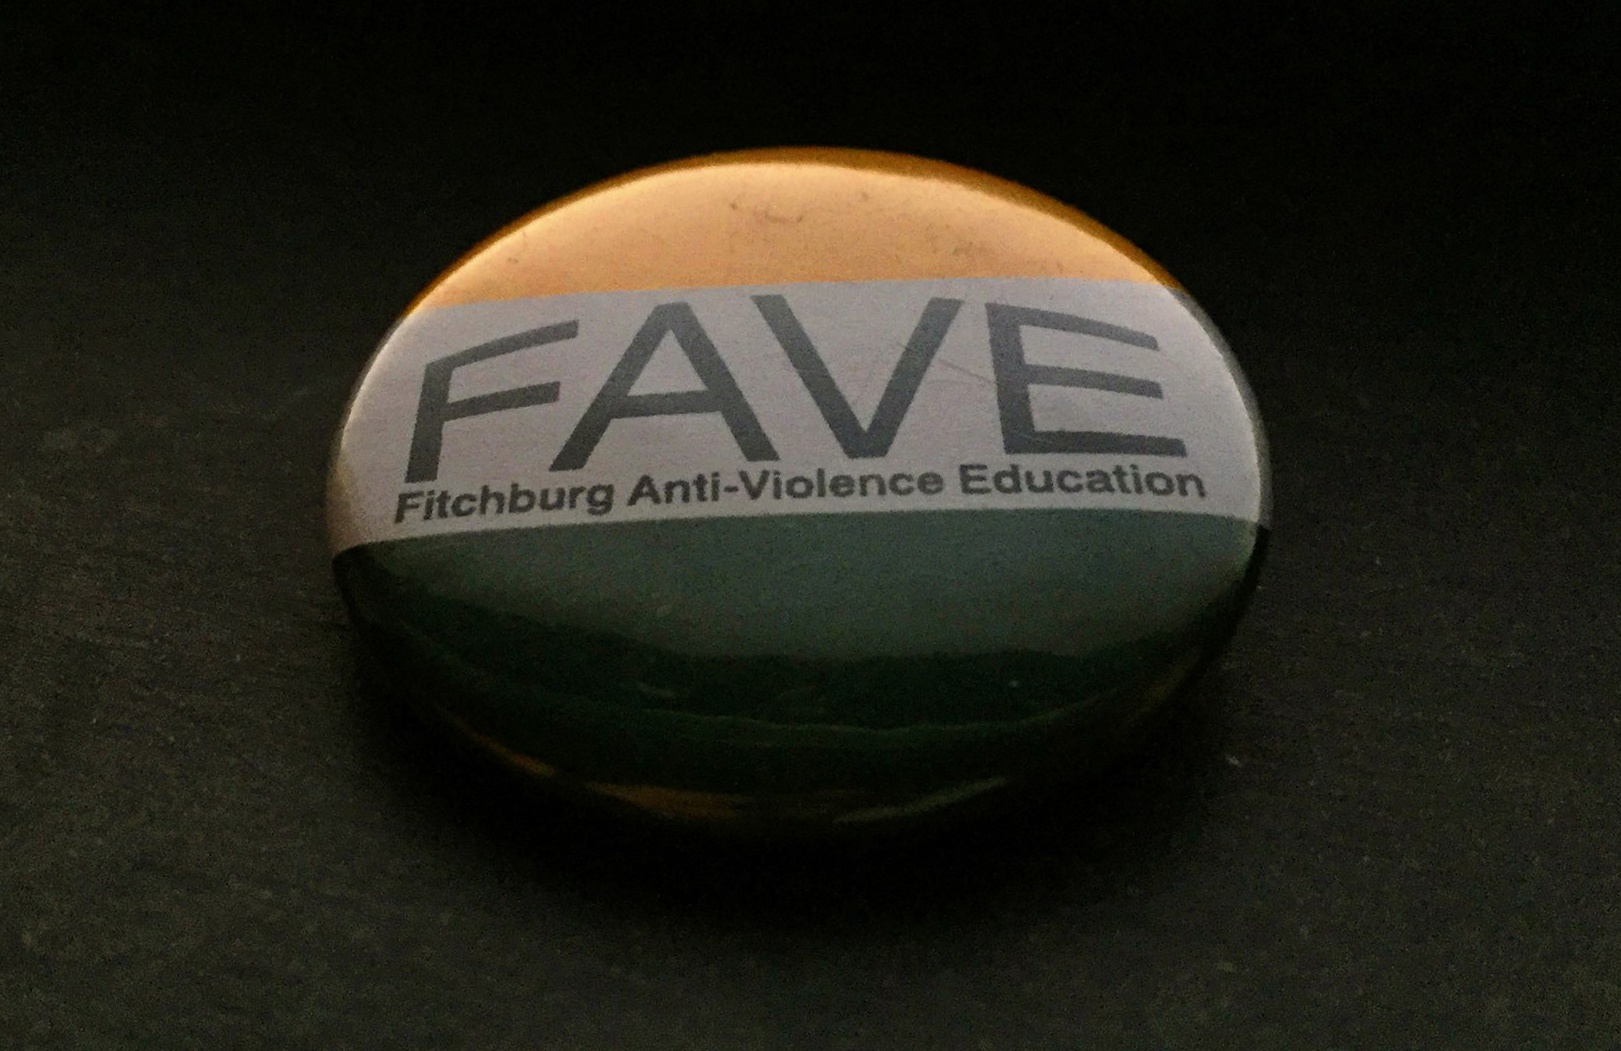 Fitchburg Anti-Violence Education (FAVE)